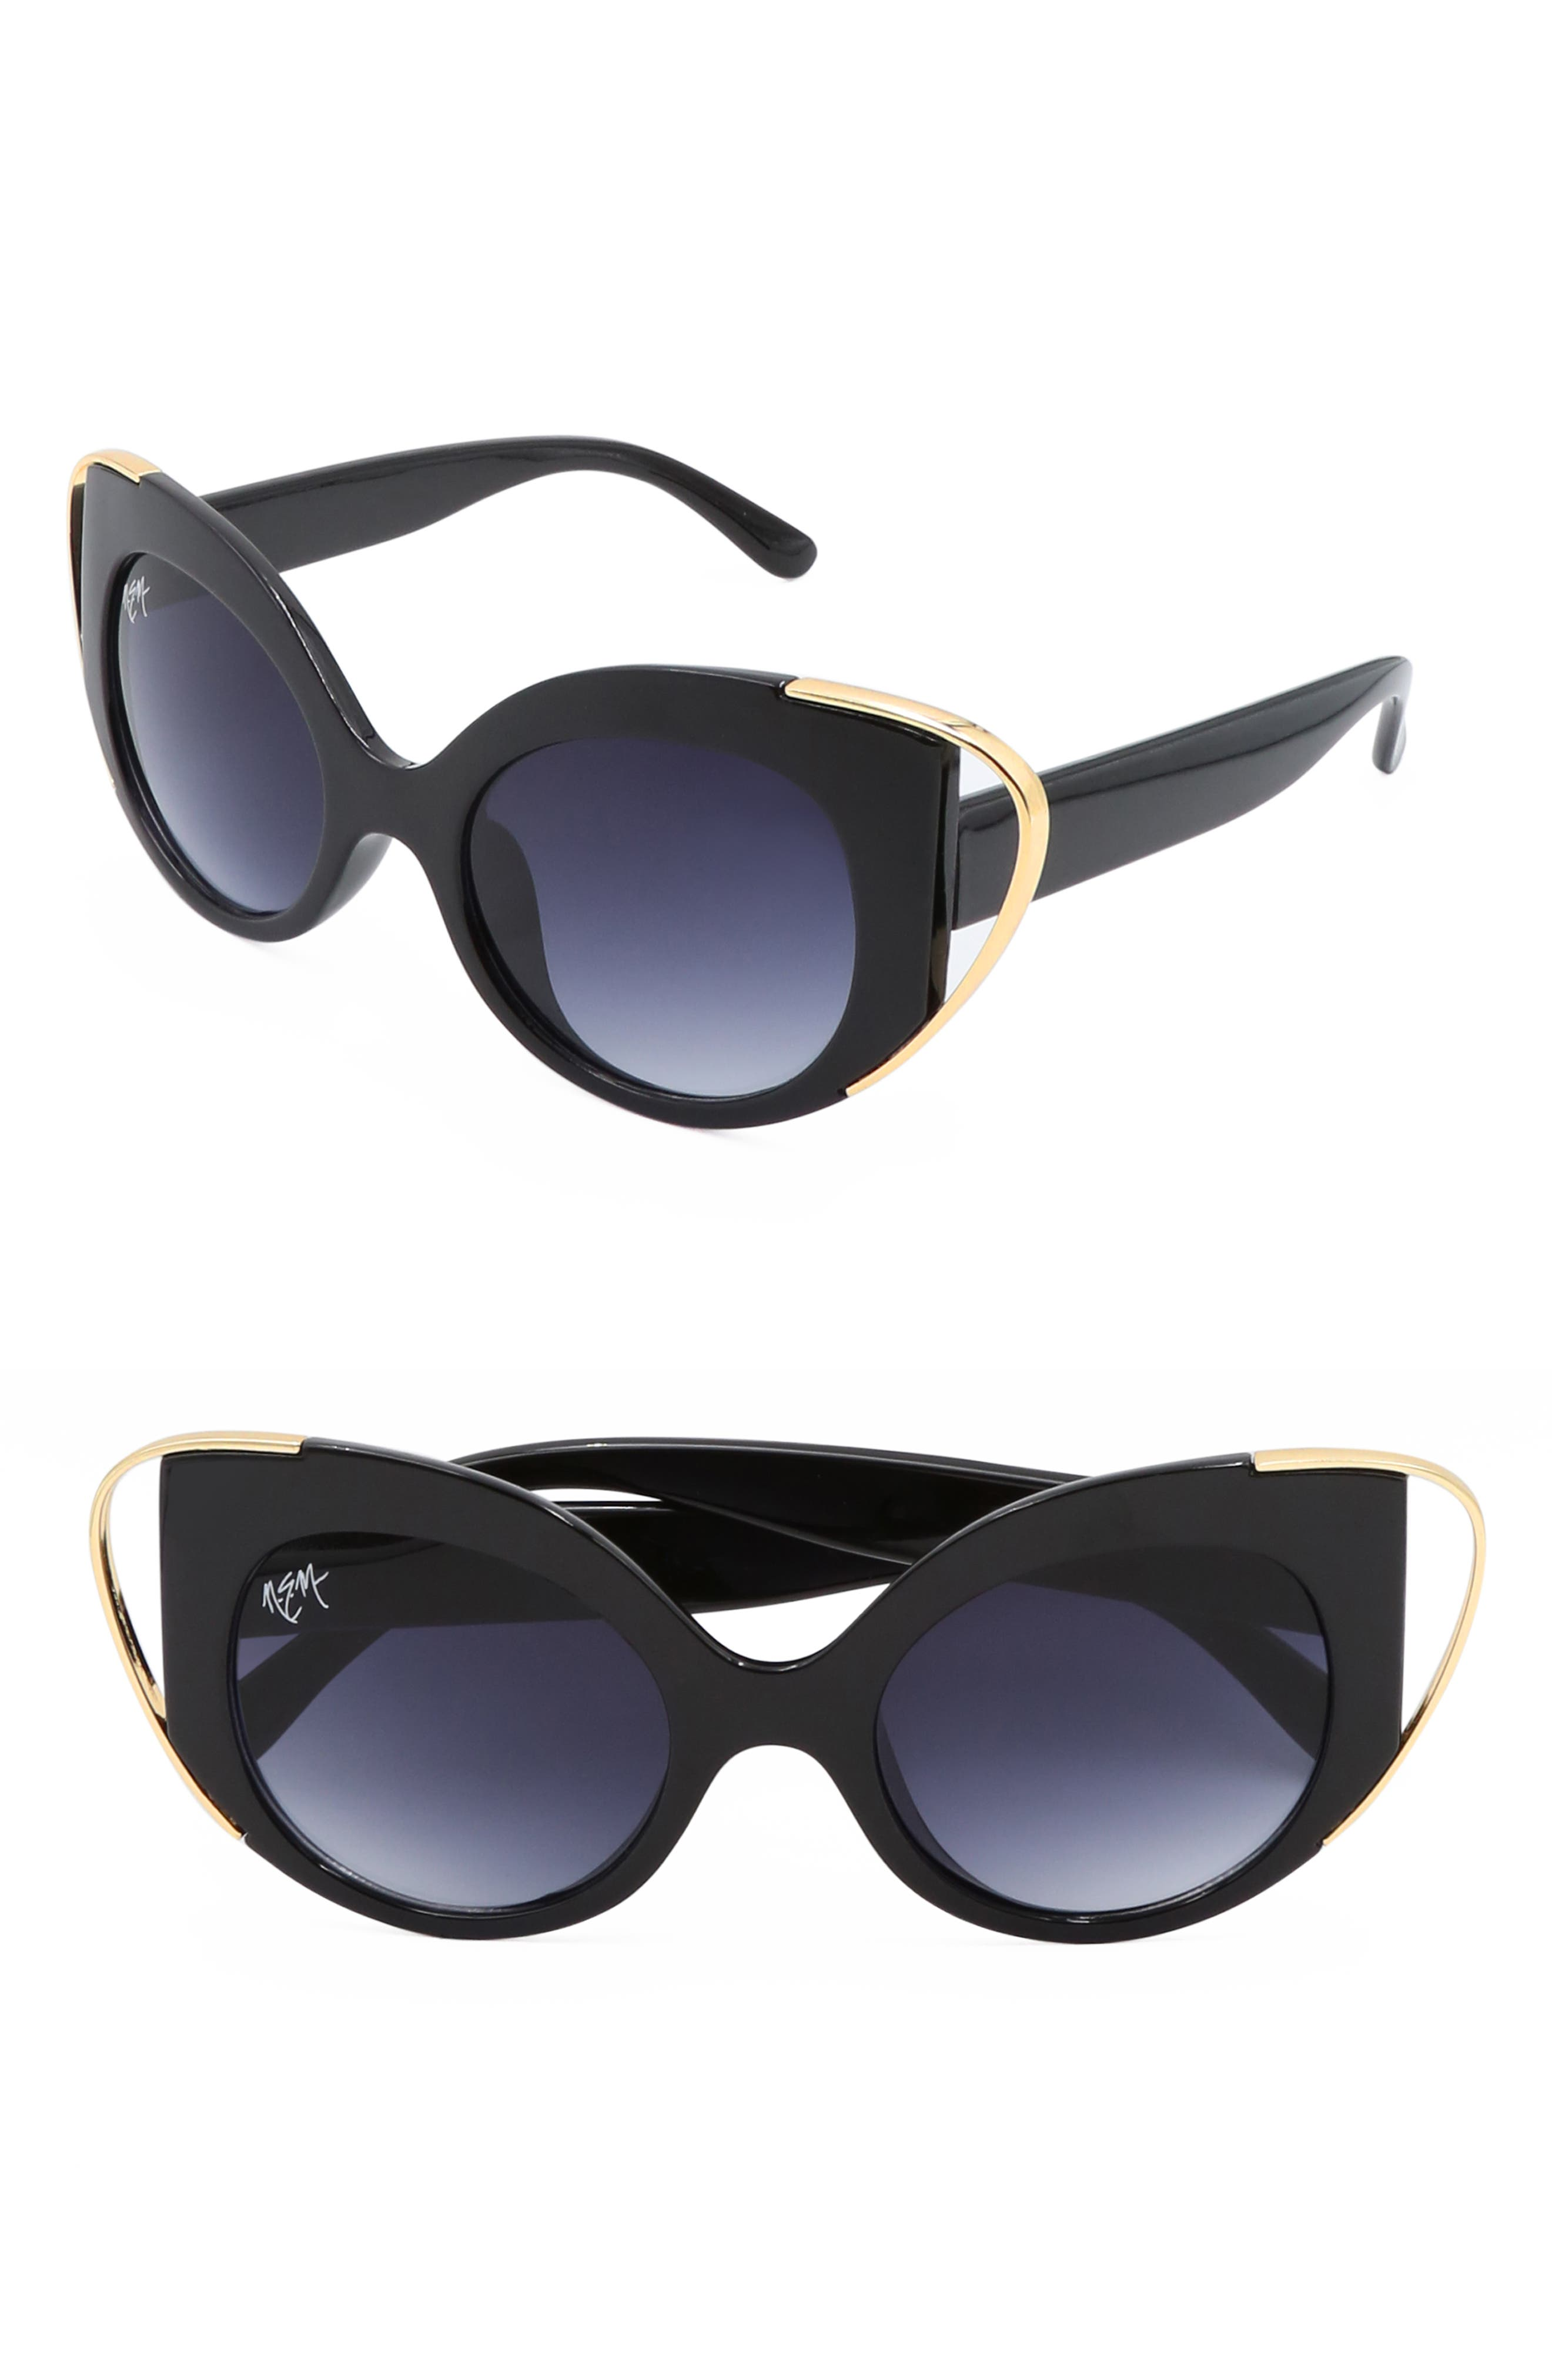 Audrey 50mm Cutout Cat Eye Sunglasses,                         Main,                         color, BLACK W DARK LENS